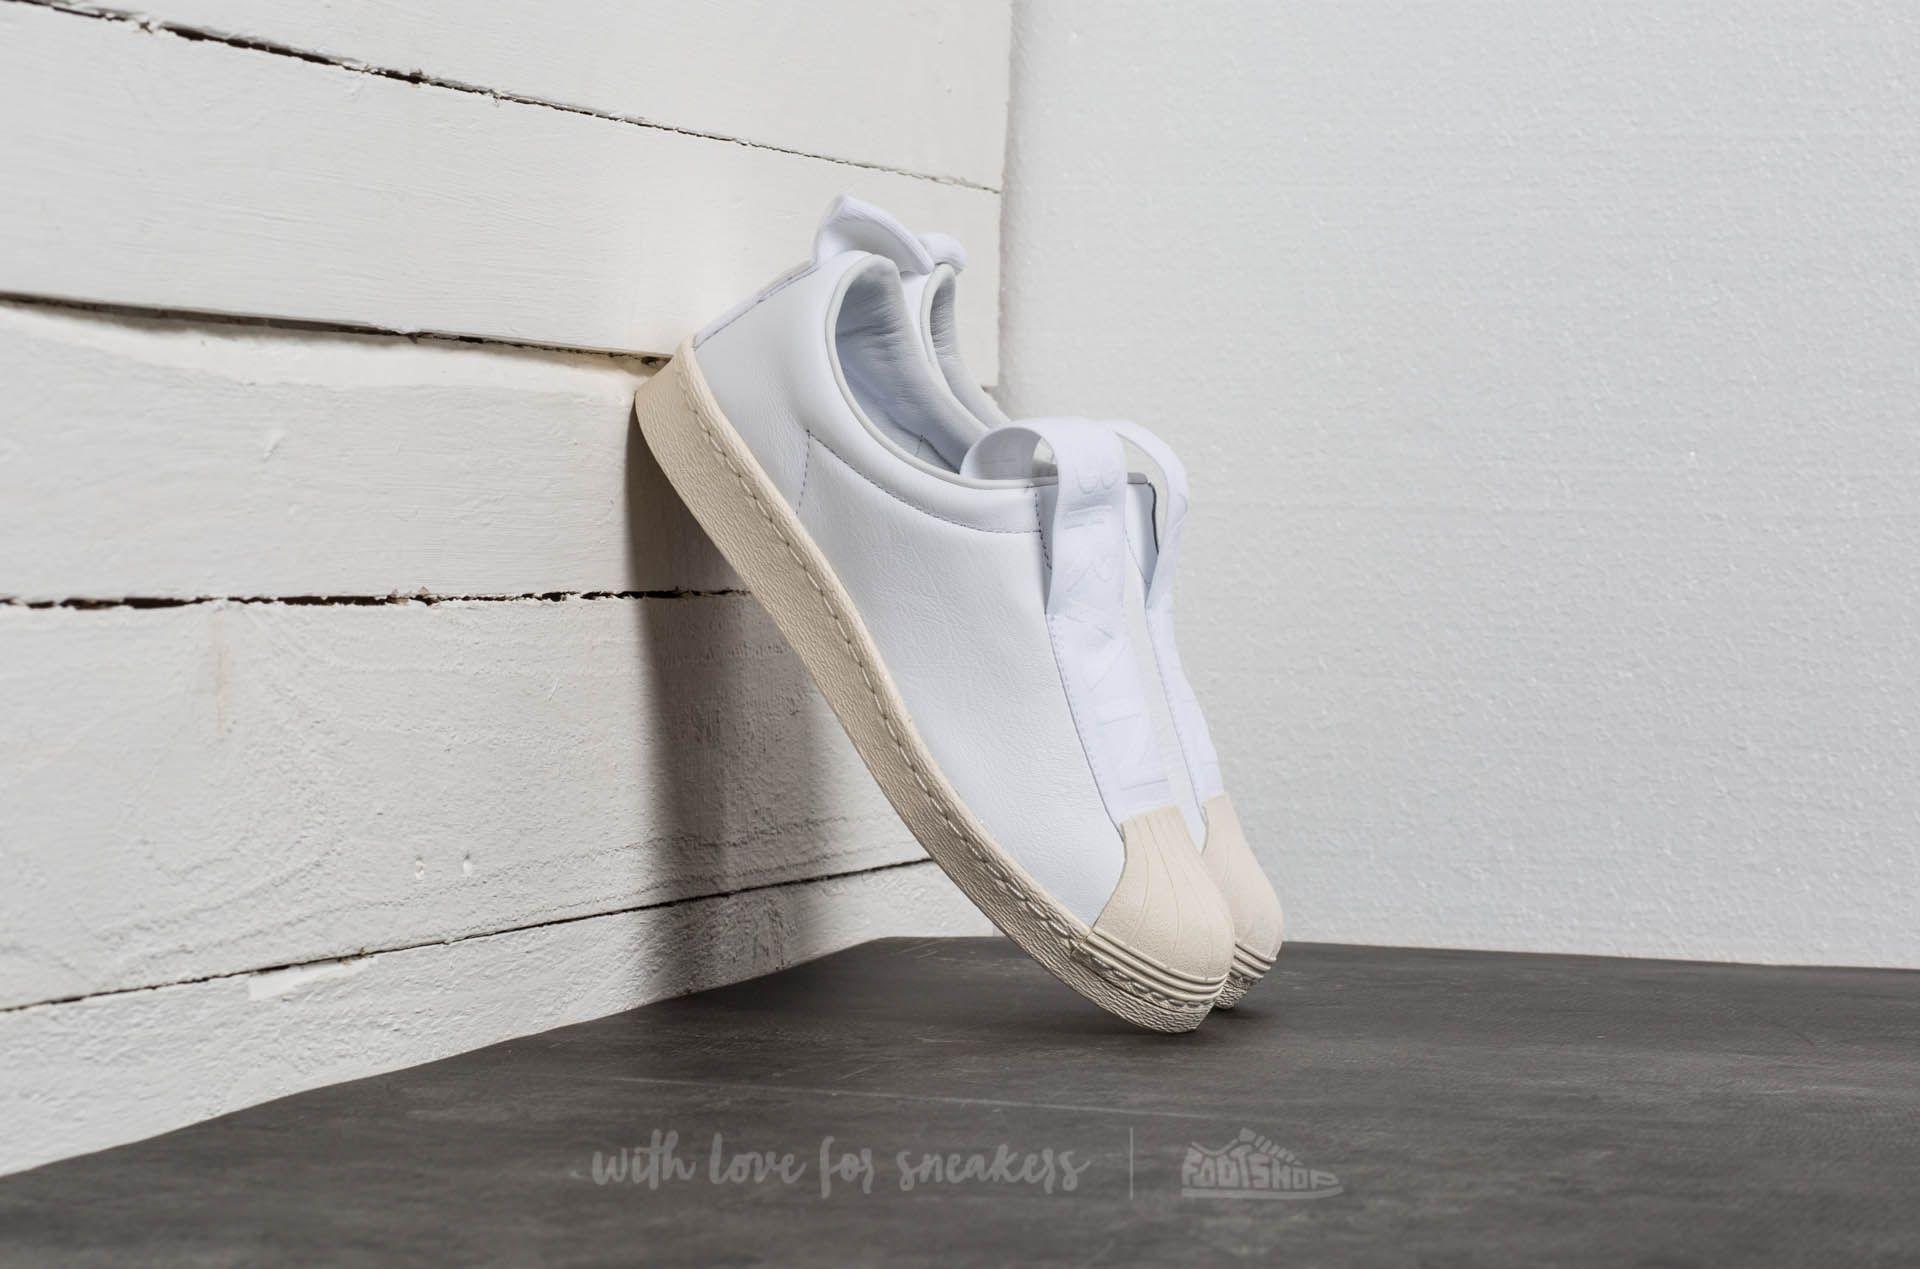 Adidas Superstar Brand With 3 Stripes Slip On Ftw White/ Ftw White/ Off White